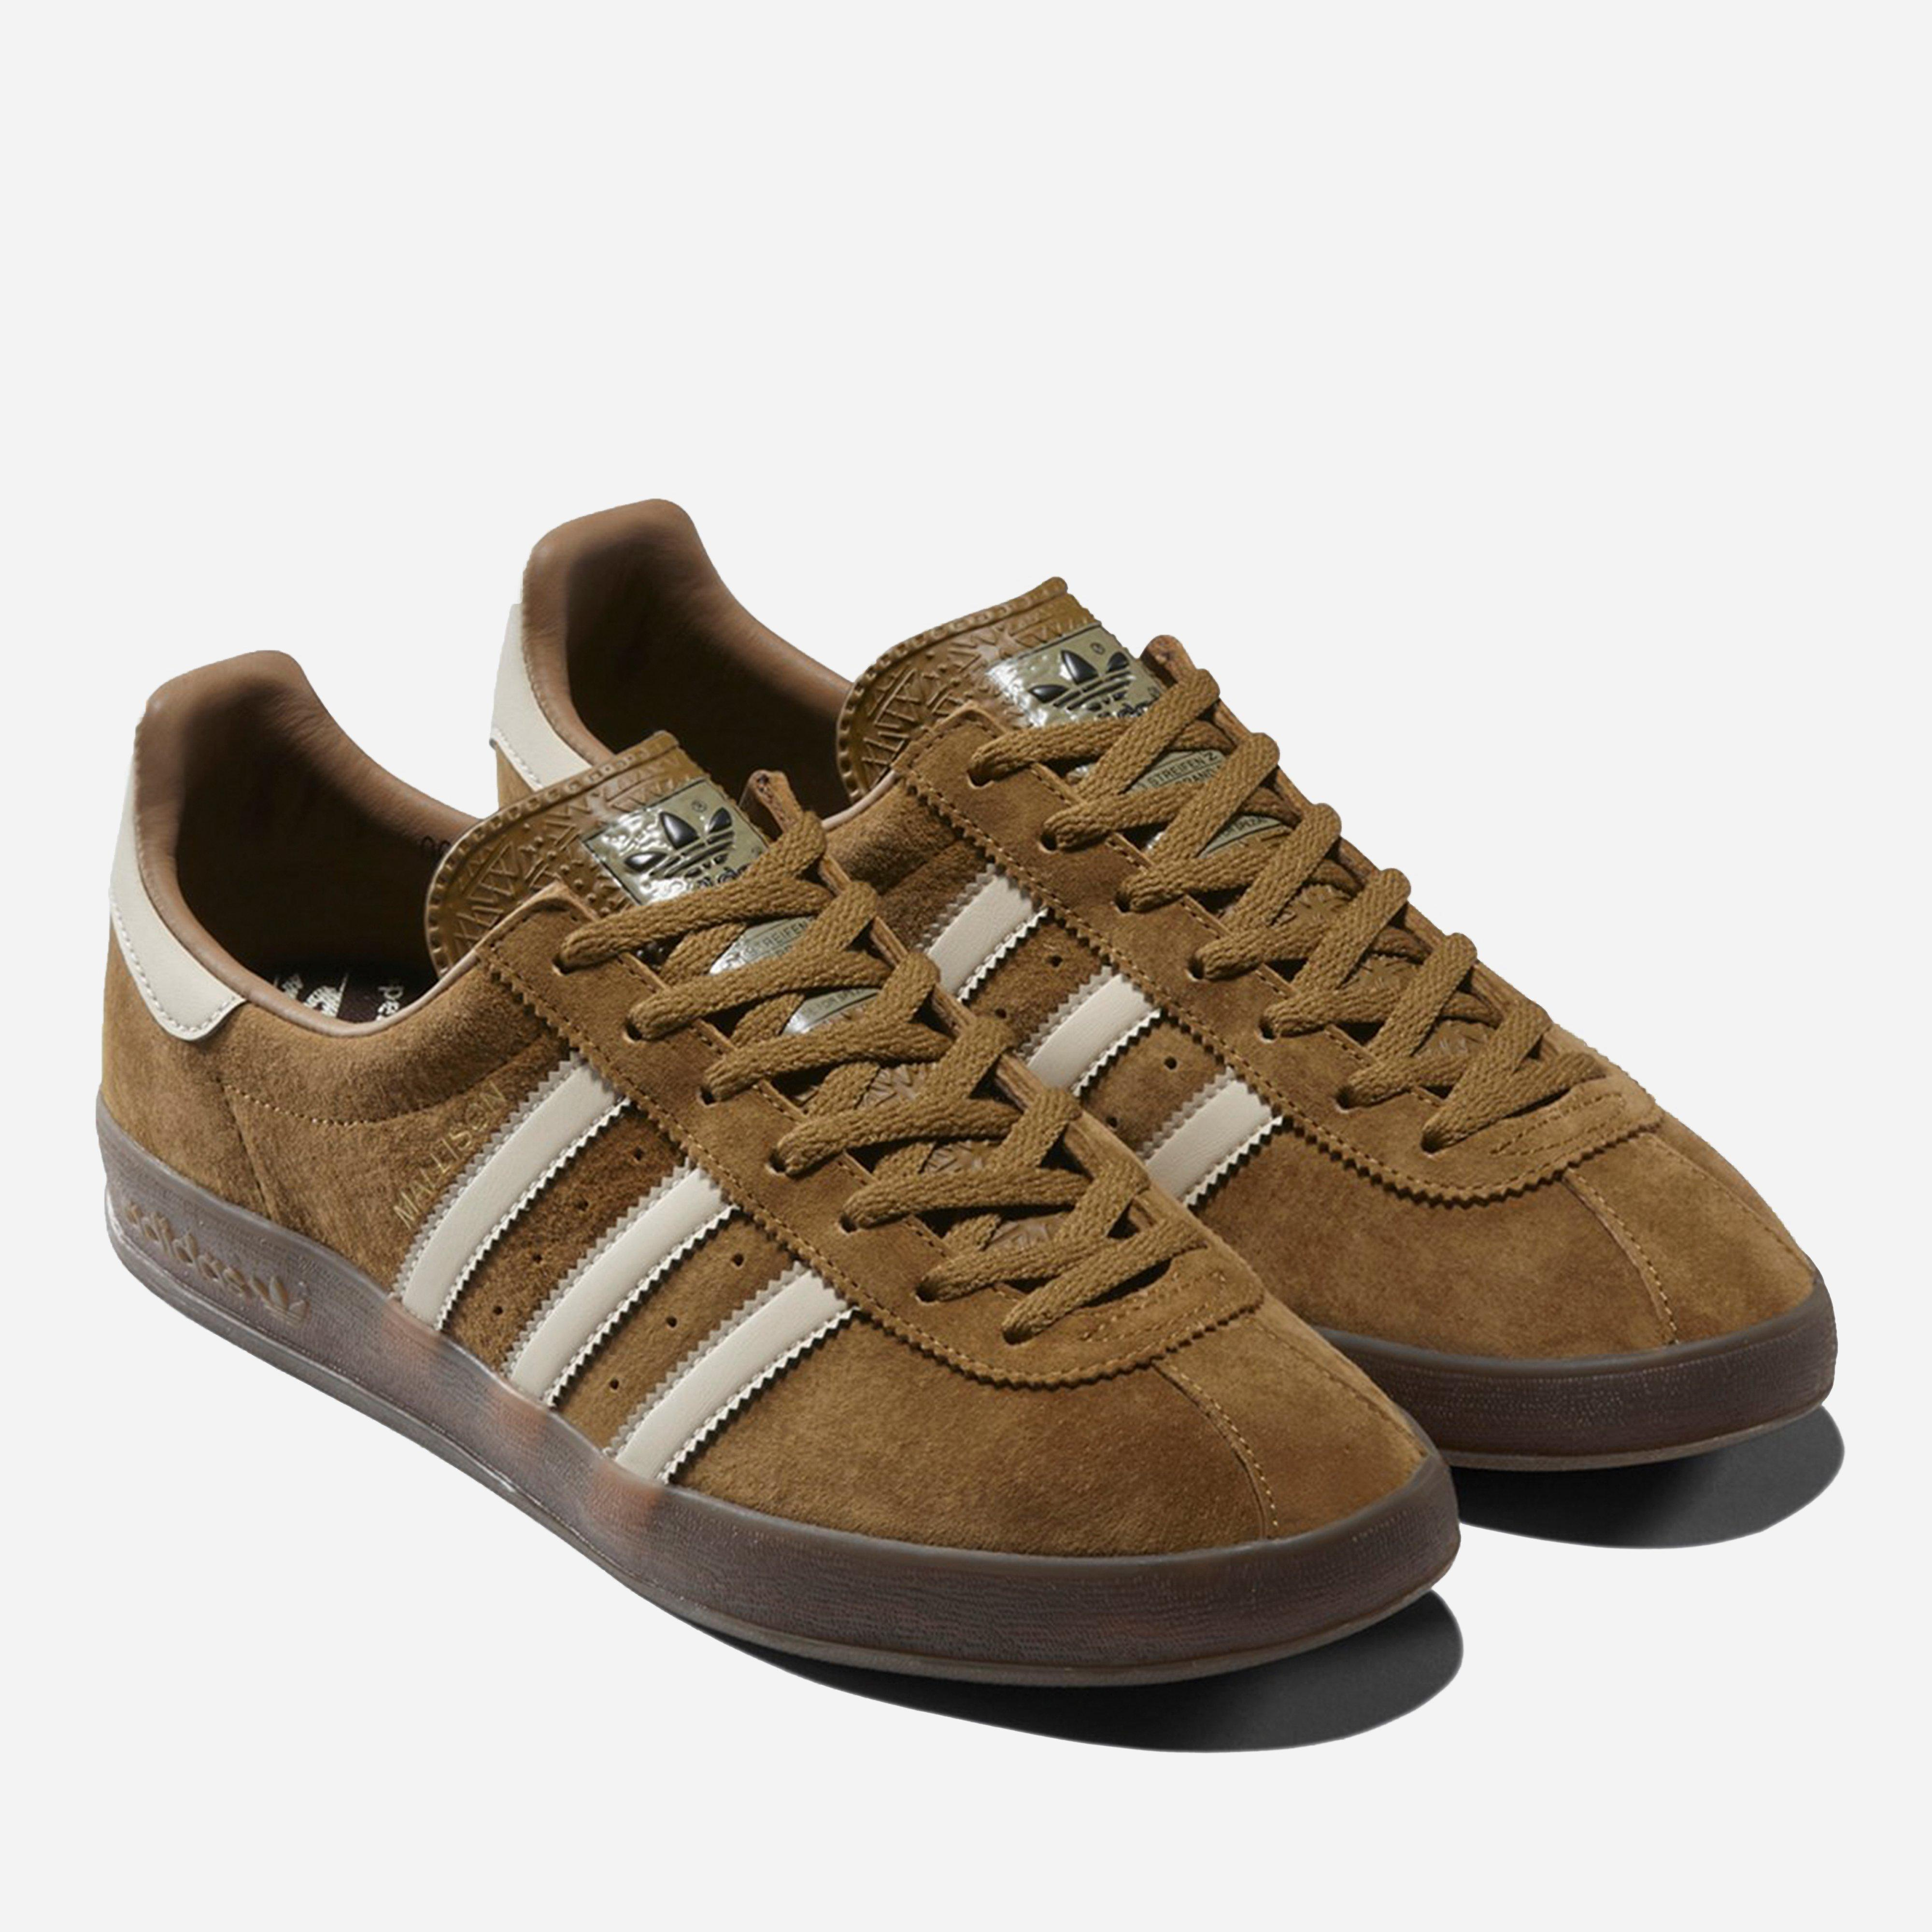 adidas originals mallison spzl brown